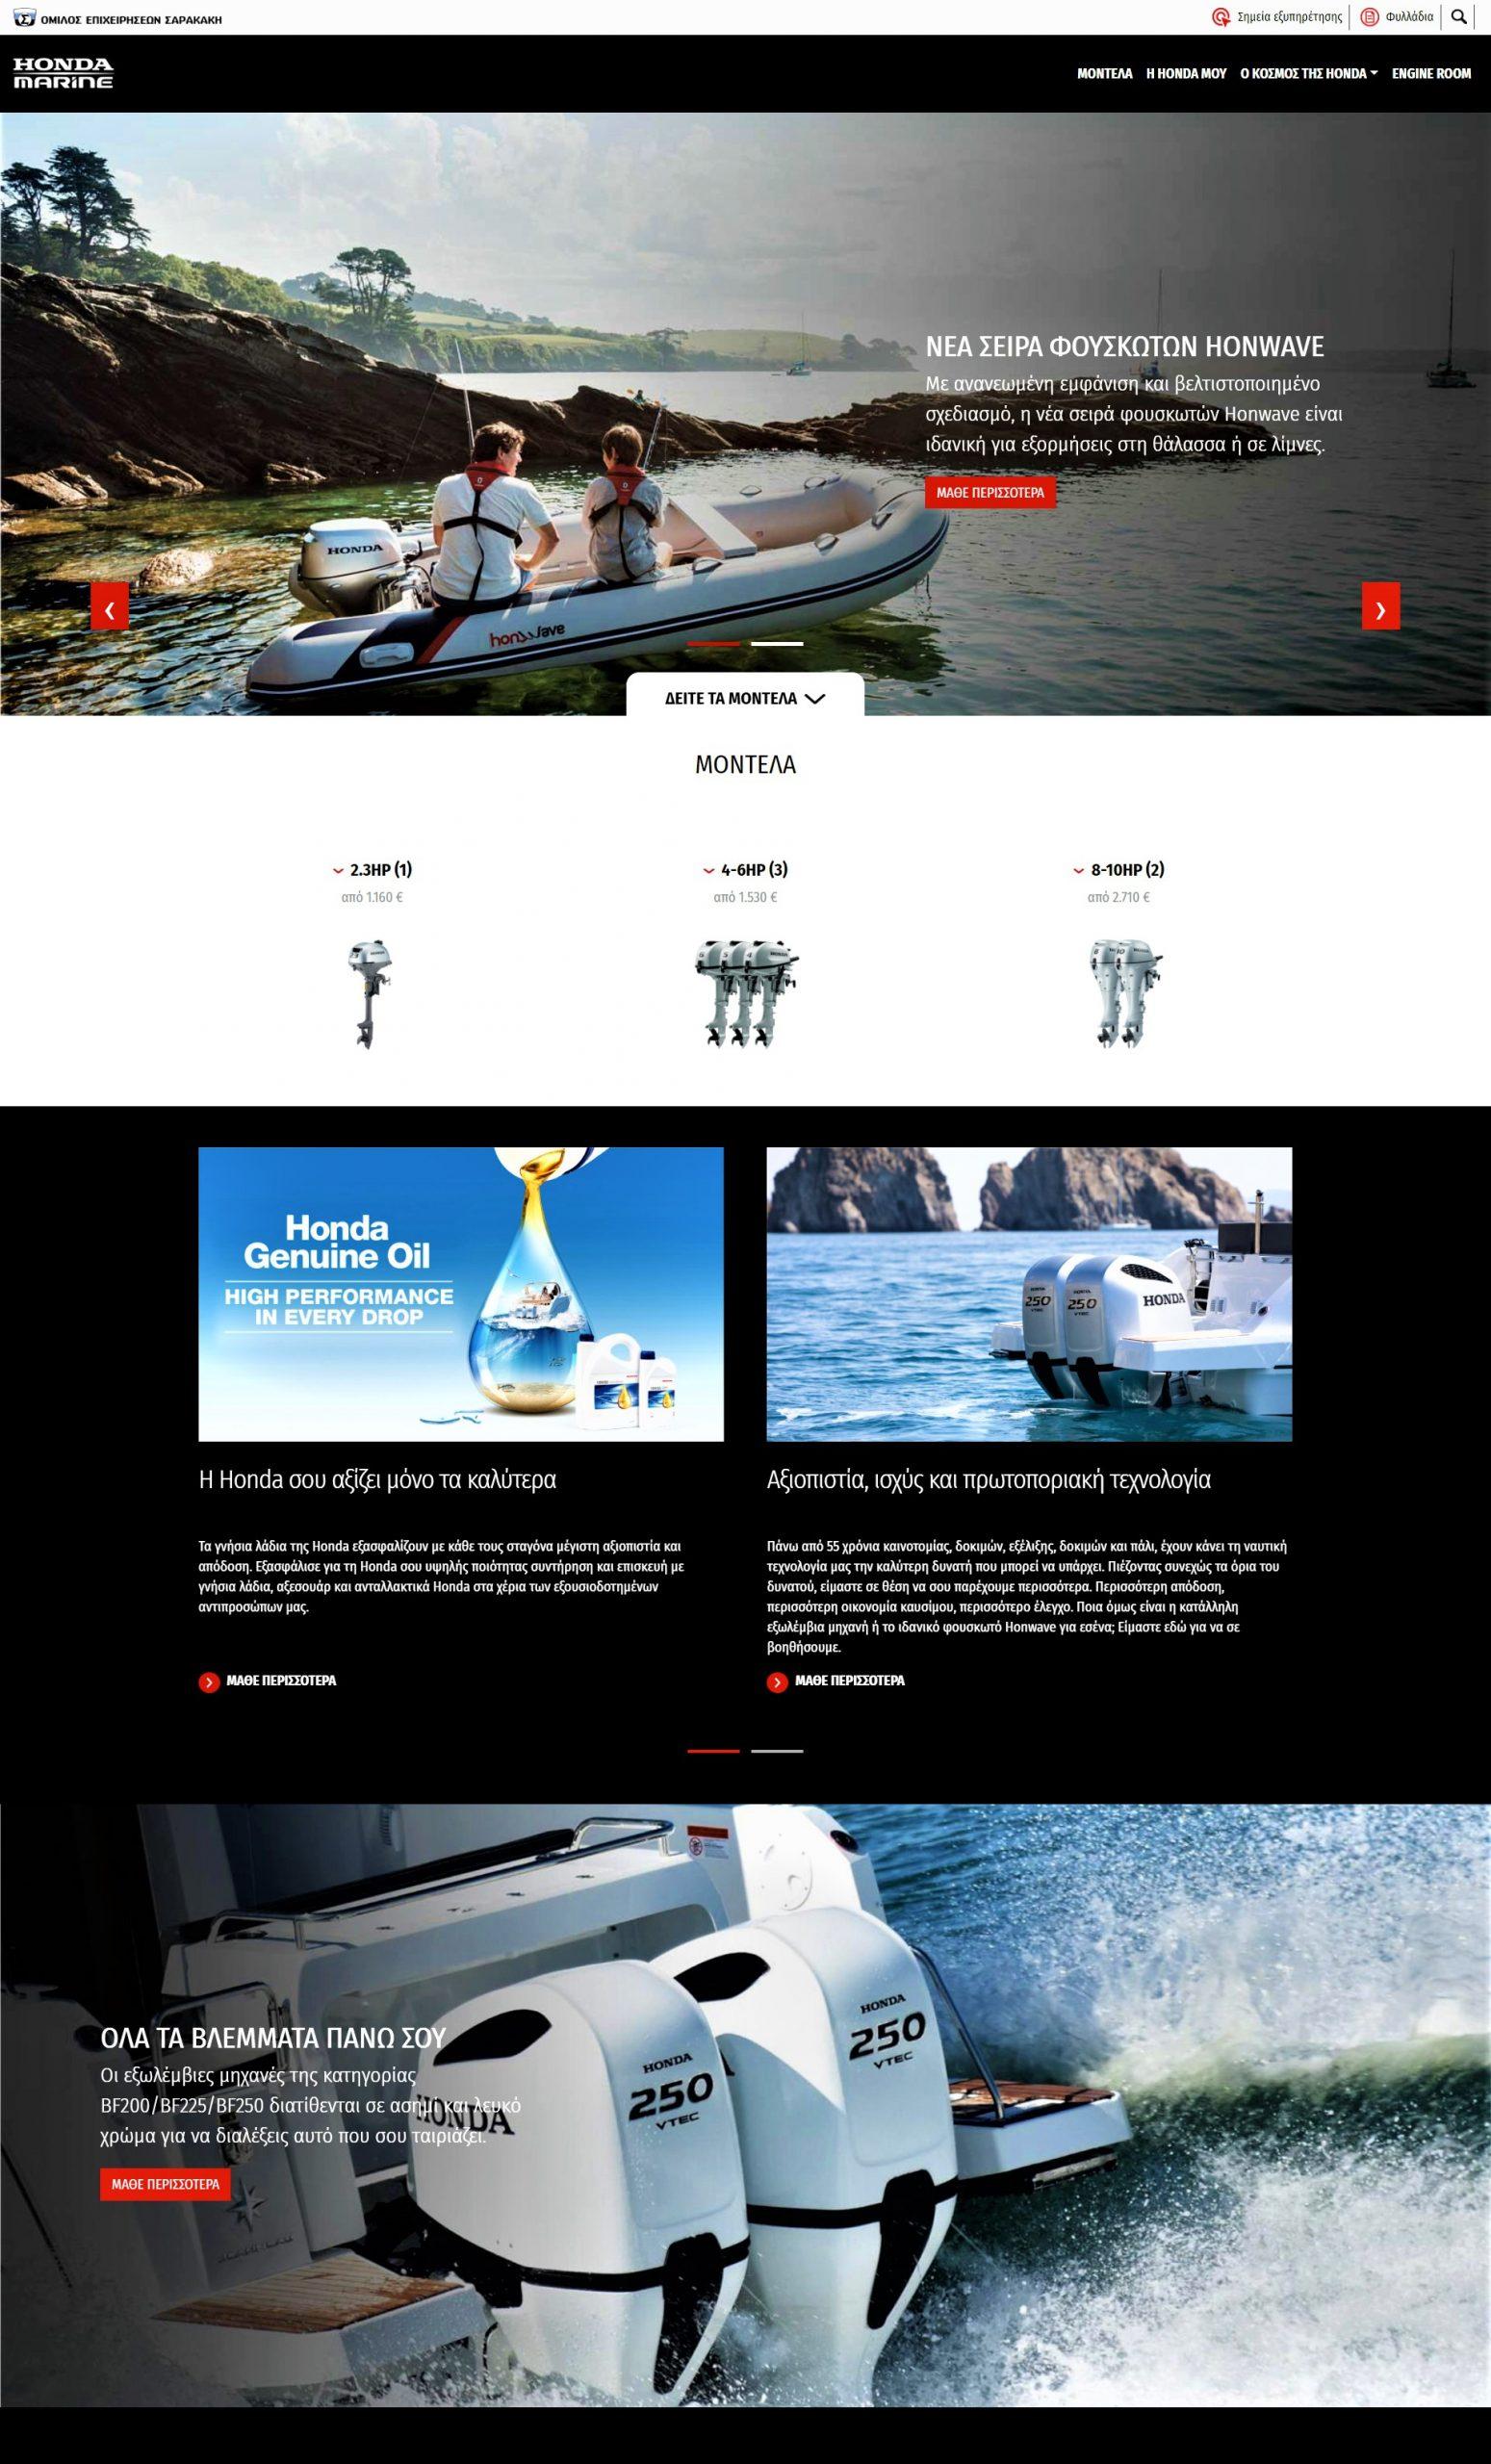 MARINE PAGES 2 hondamarine gr 4 6HP 2021 06 22 14 57 40 scaled Είδατε το Νέο Website της Honda; Honda, ειδήσεις, Νέα